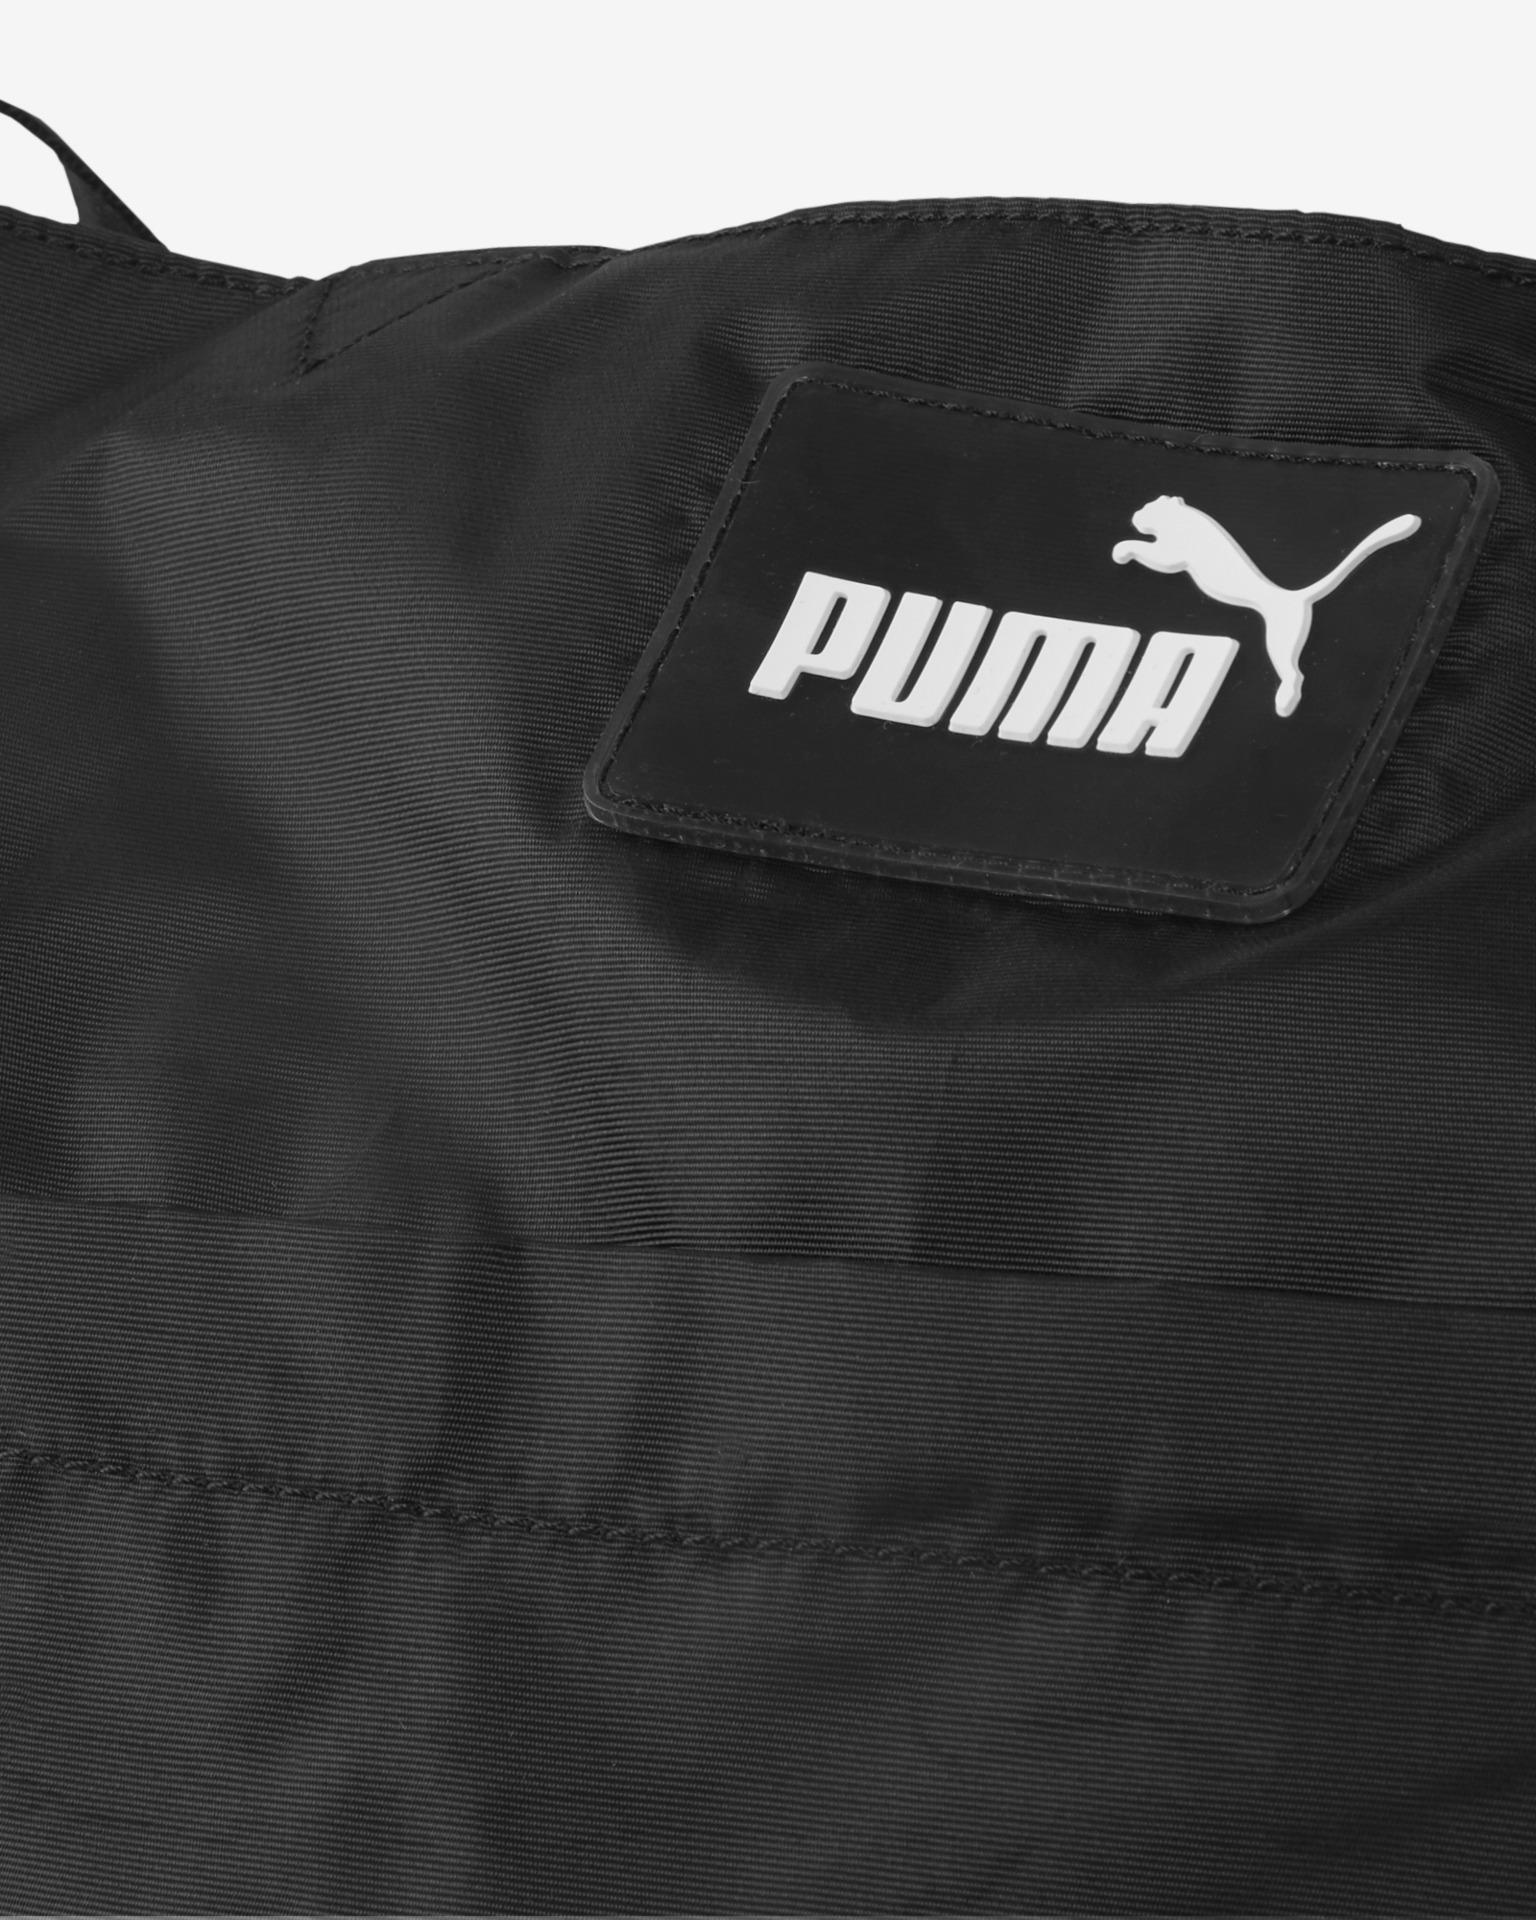 Puma Women's bag black  Pop